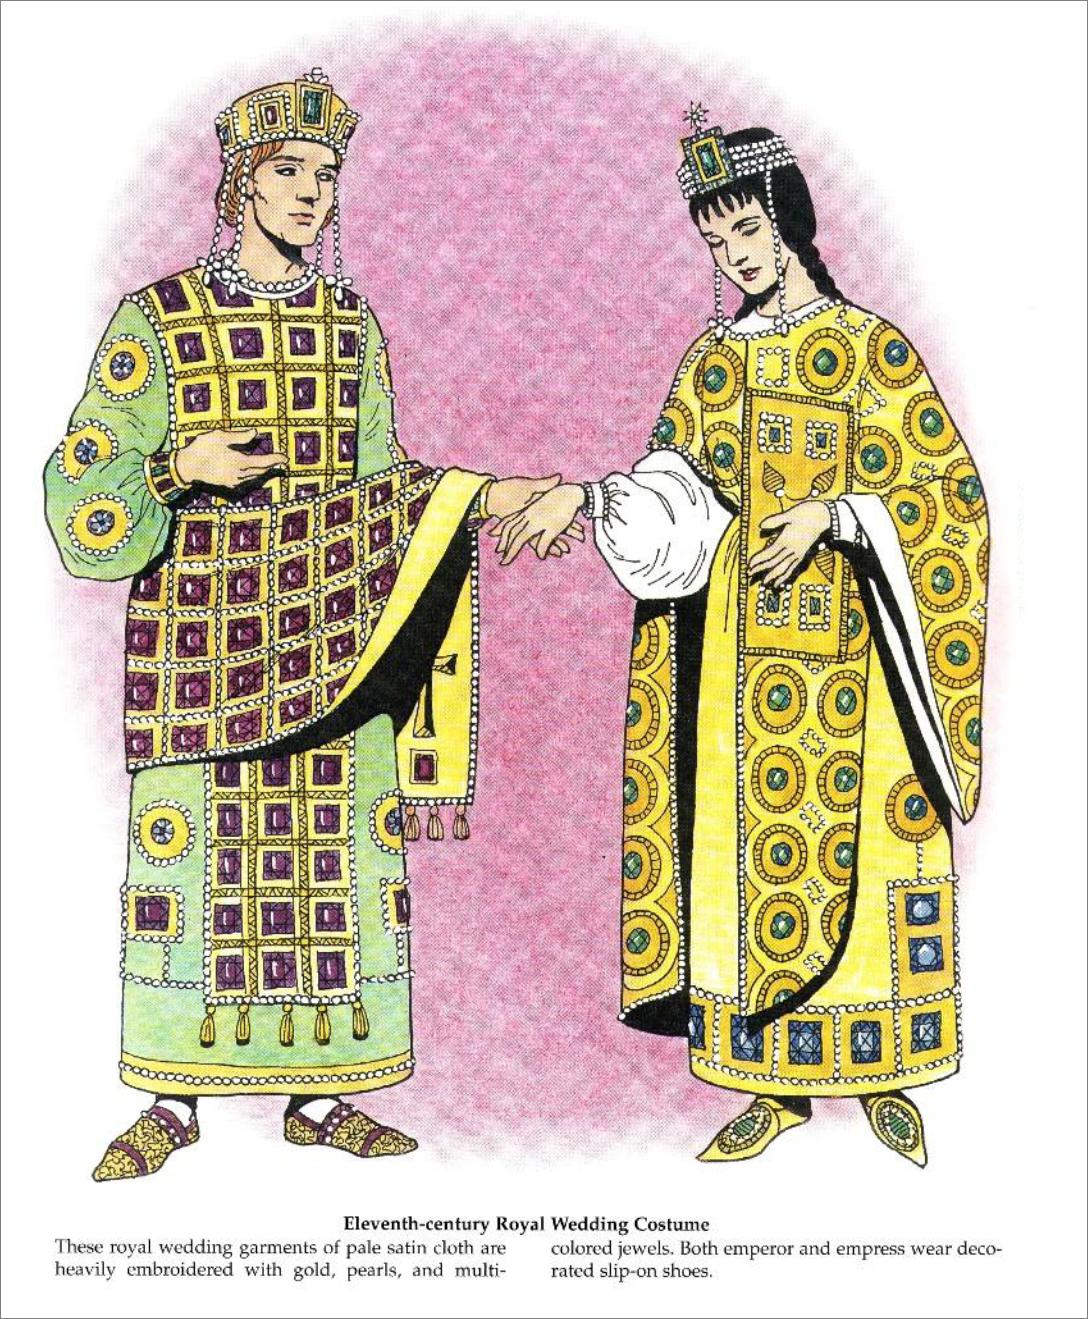 11th Century Royal Wedding Clothing